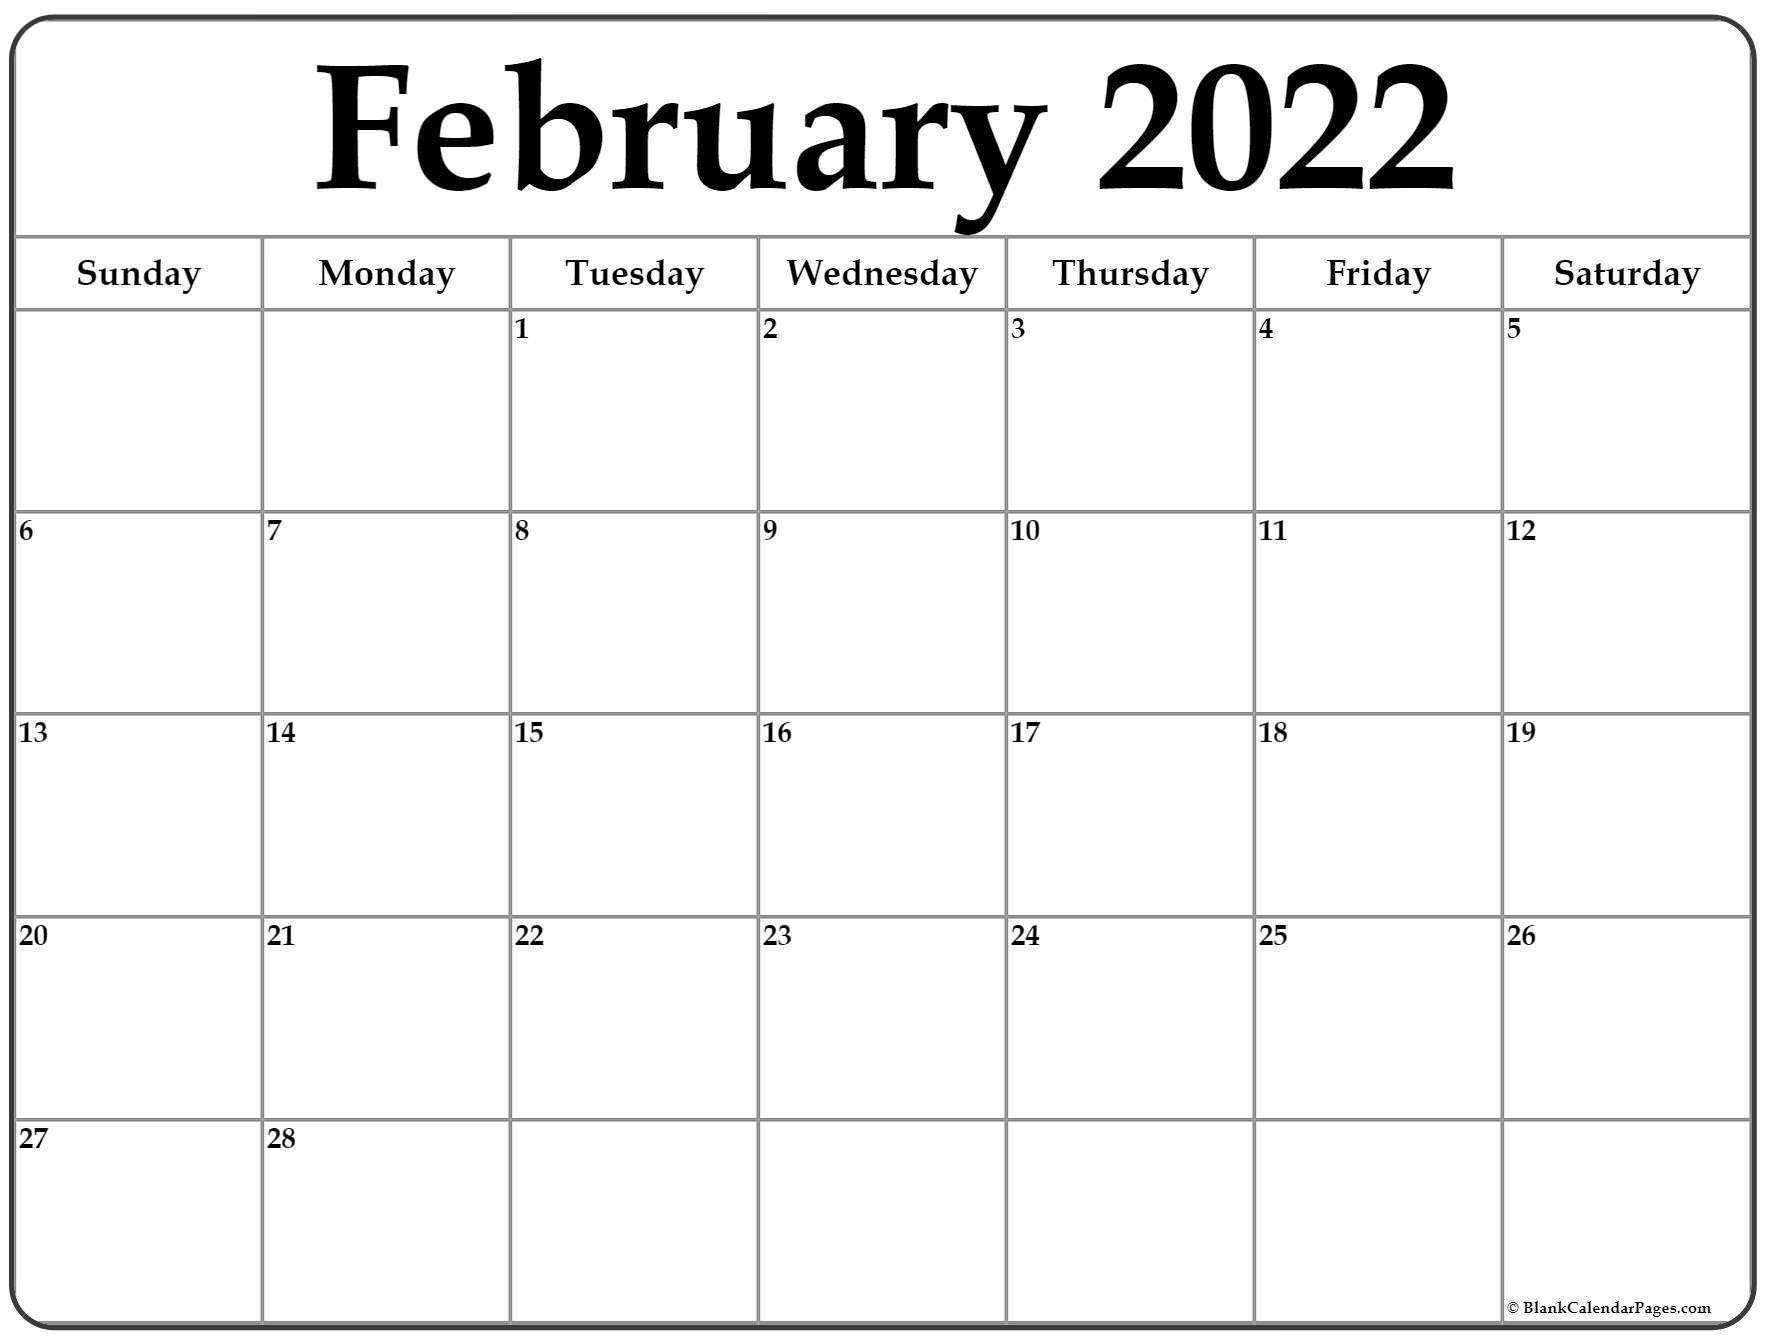 February 2022 Calendar | Free Printable Calendar Templates with regard to Picture Of Calendar For February 2022